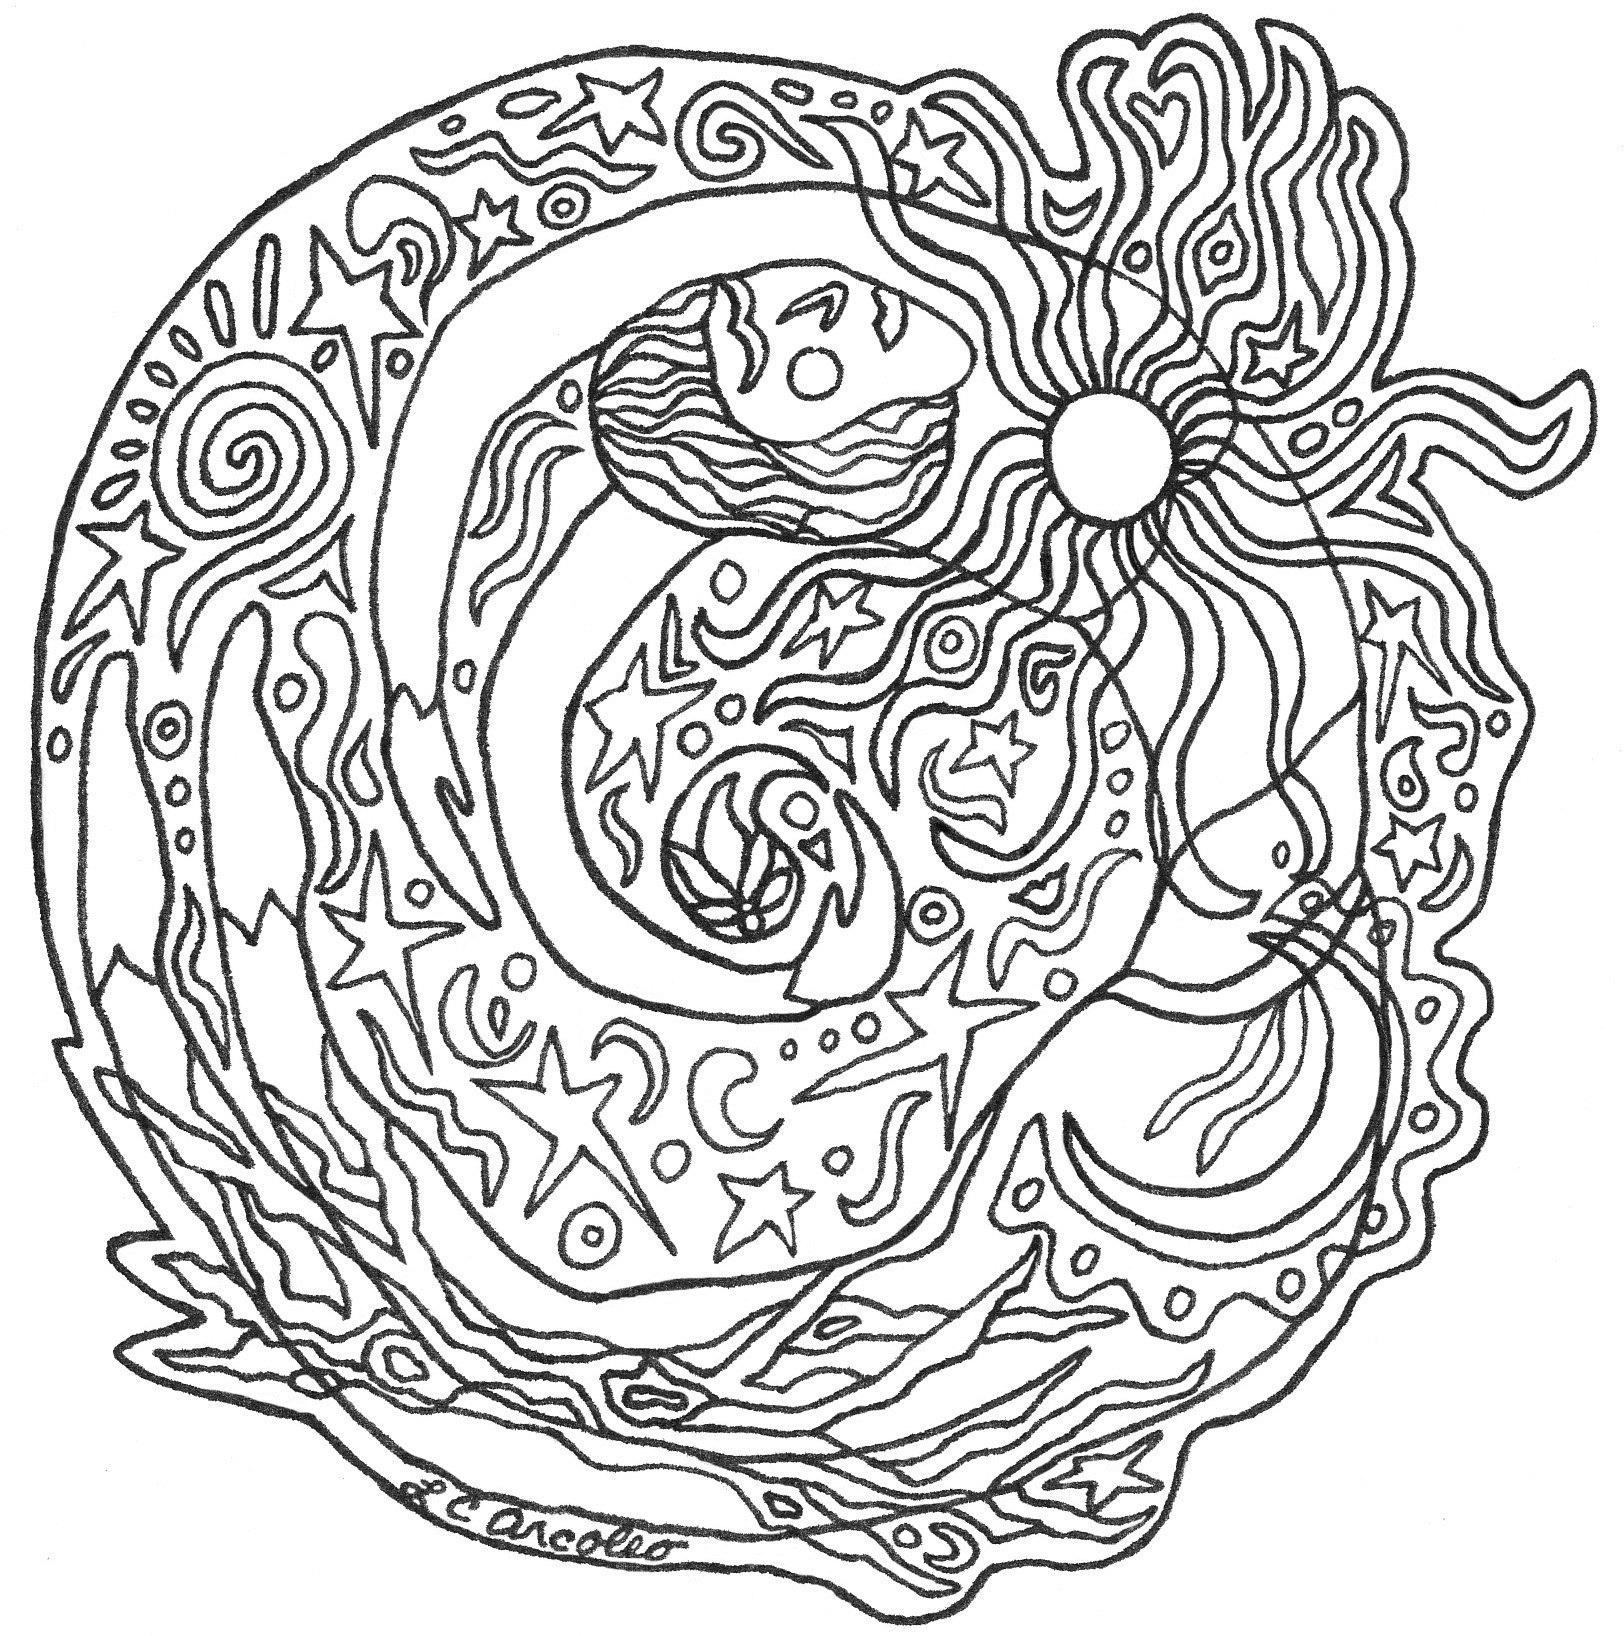 b u00e9ni dessin grandeur nature lamin u00e9  u00e0 la main reiki